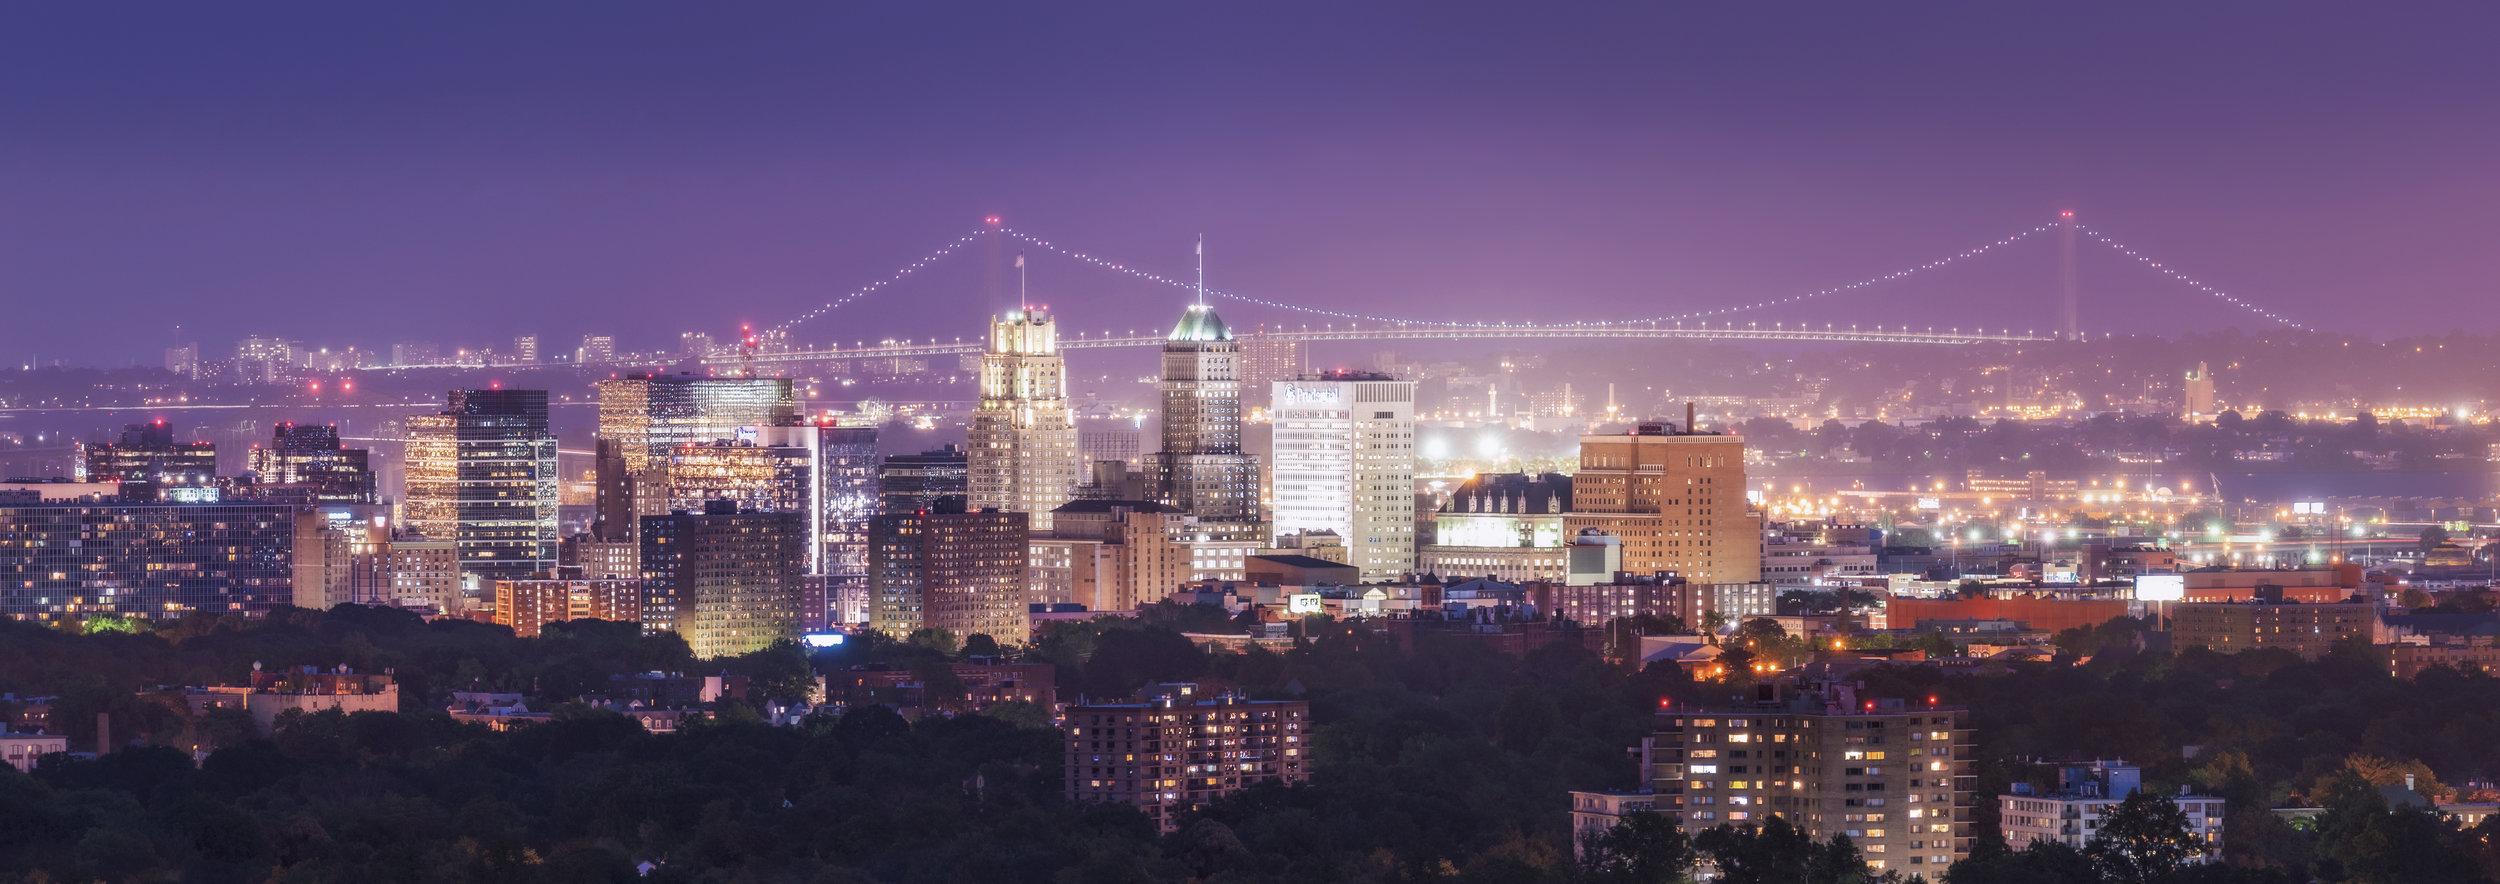 Newark I